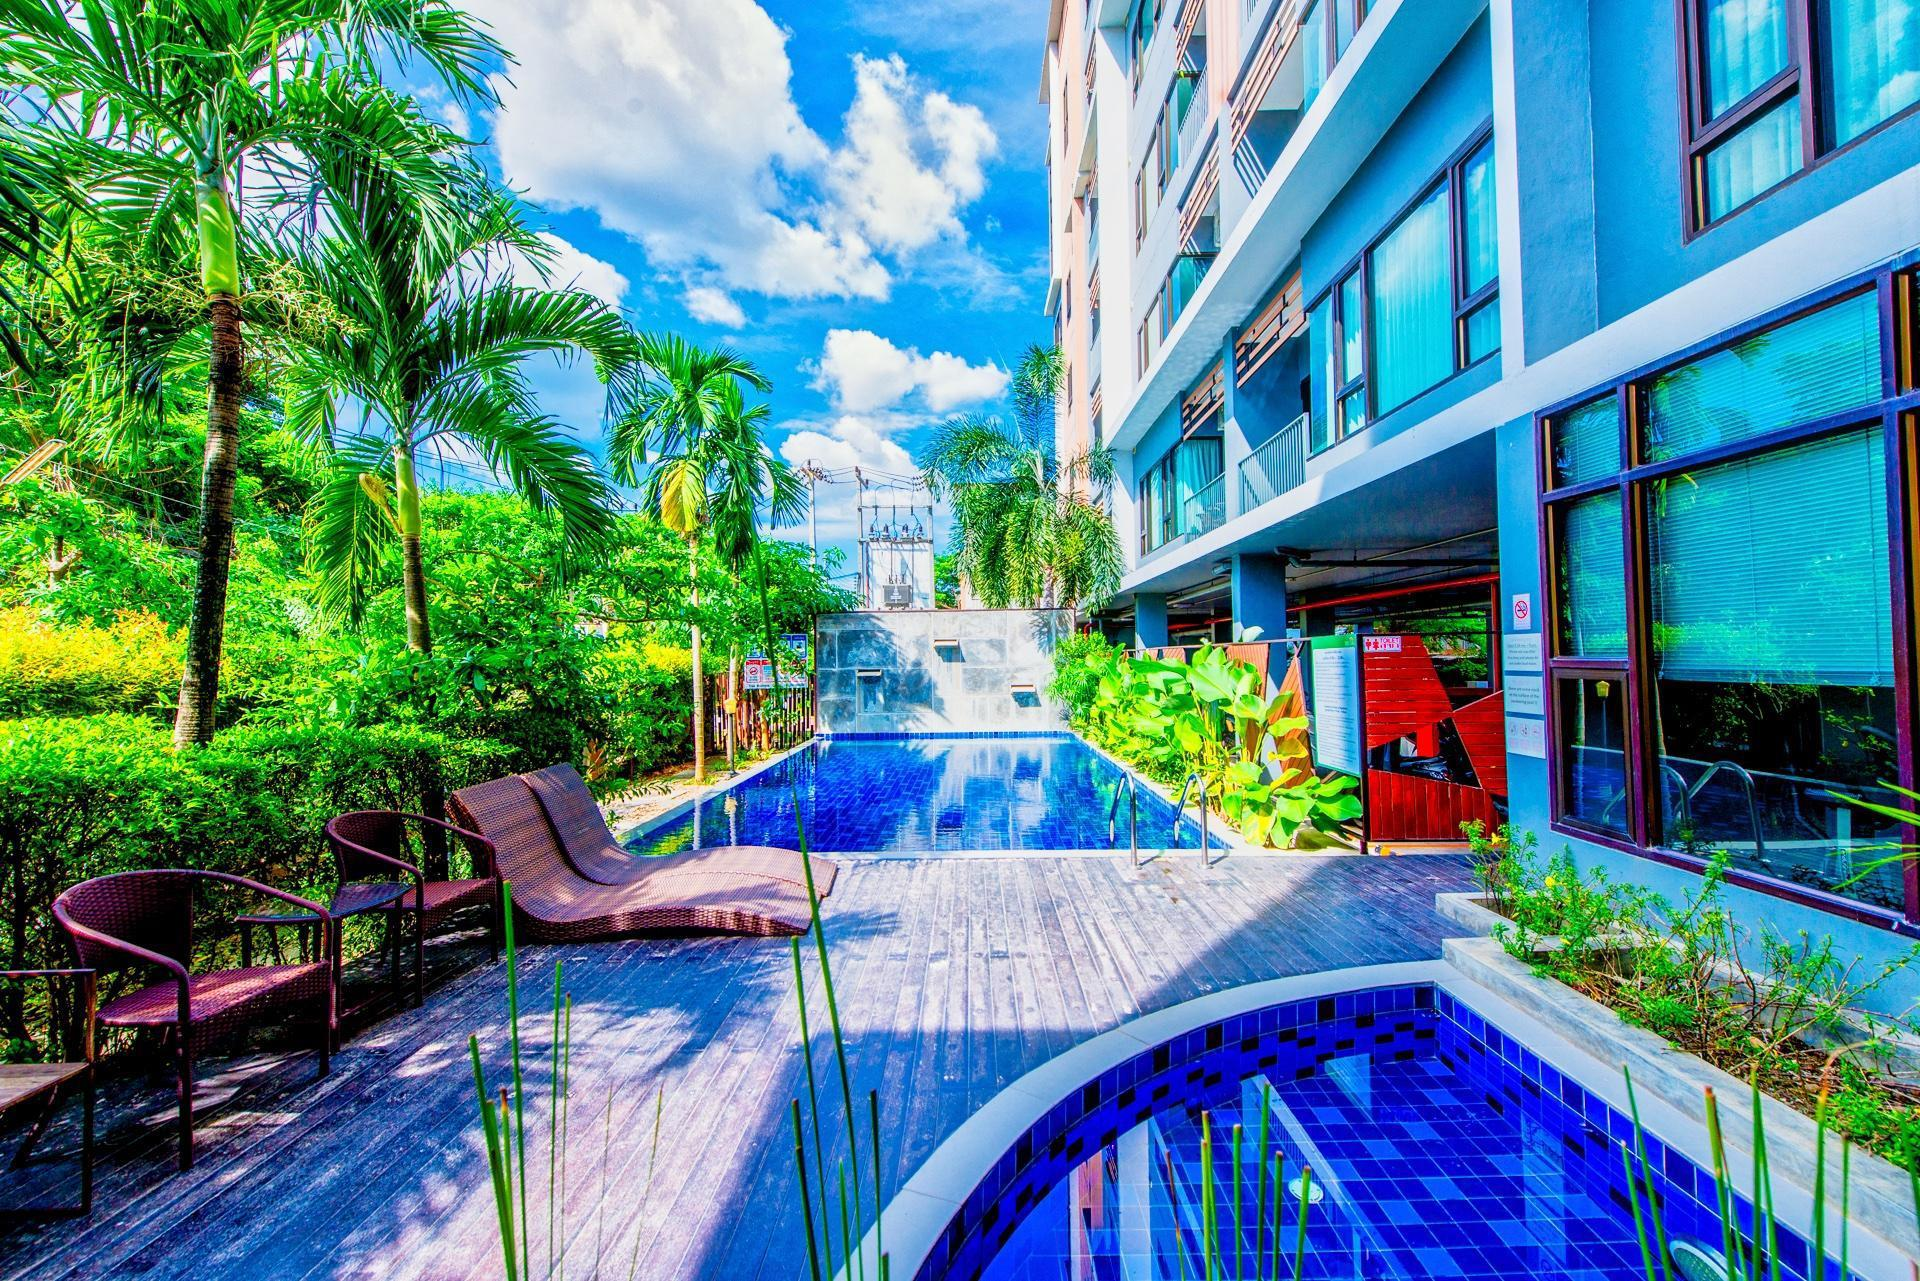 Tree Boutique Resort ทรี บูทีก รีสอร์ต